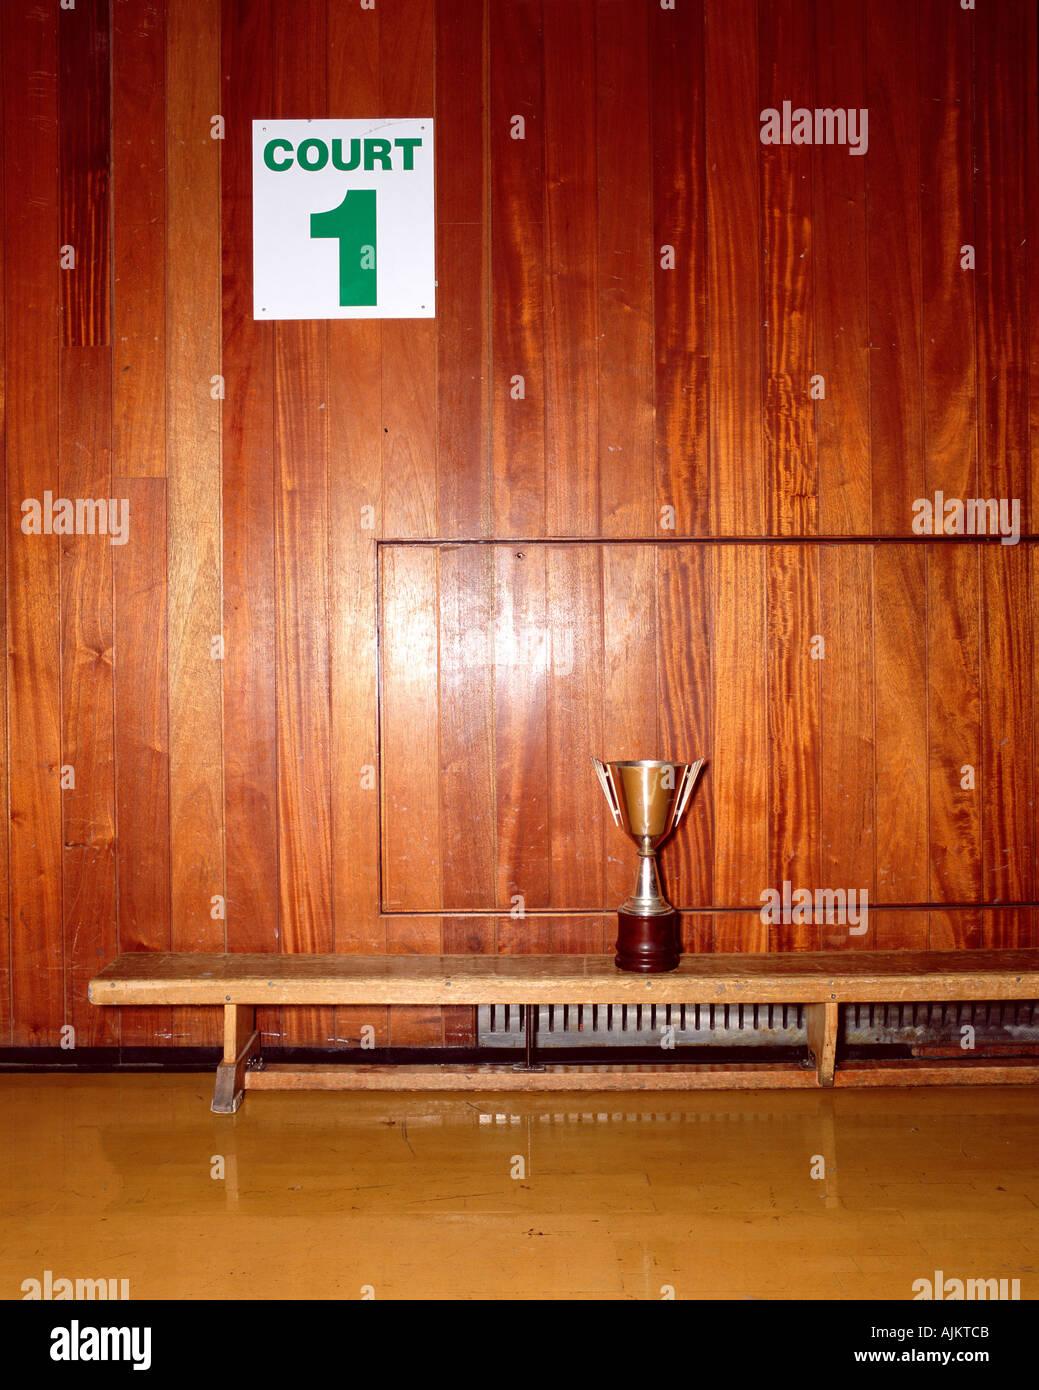 Trofeo en la cancha deportiva Imagen De Stock